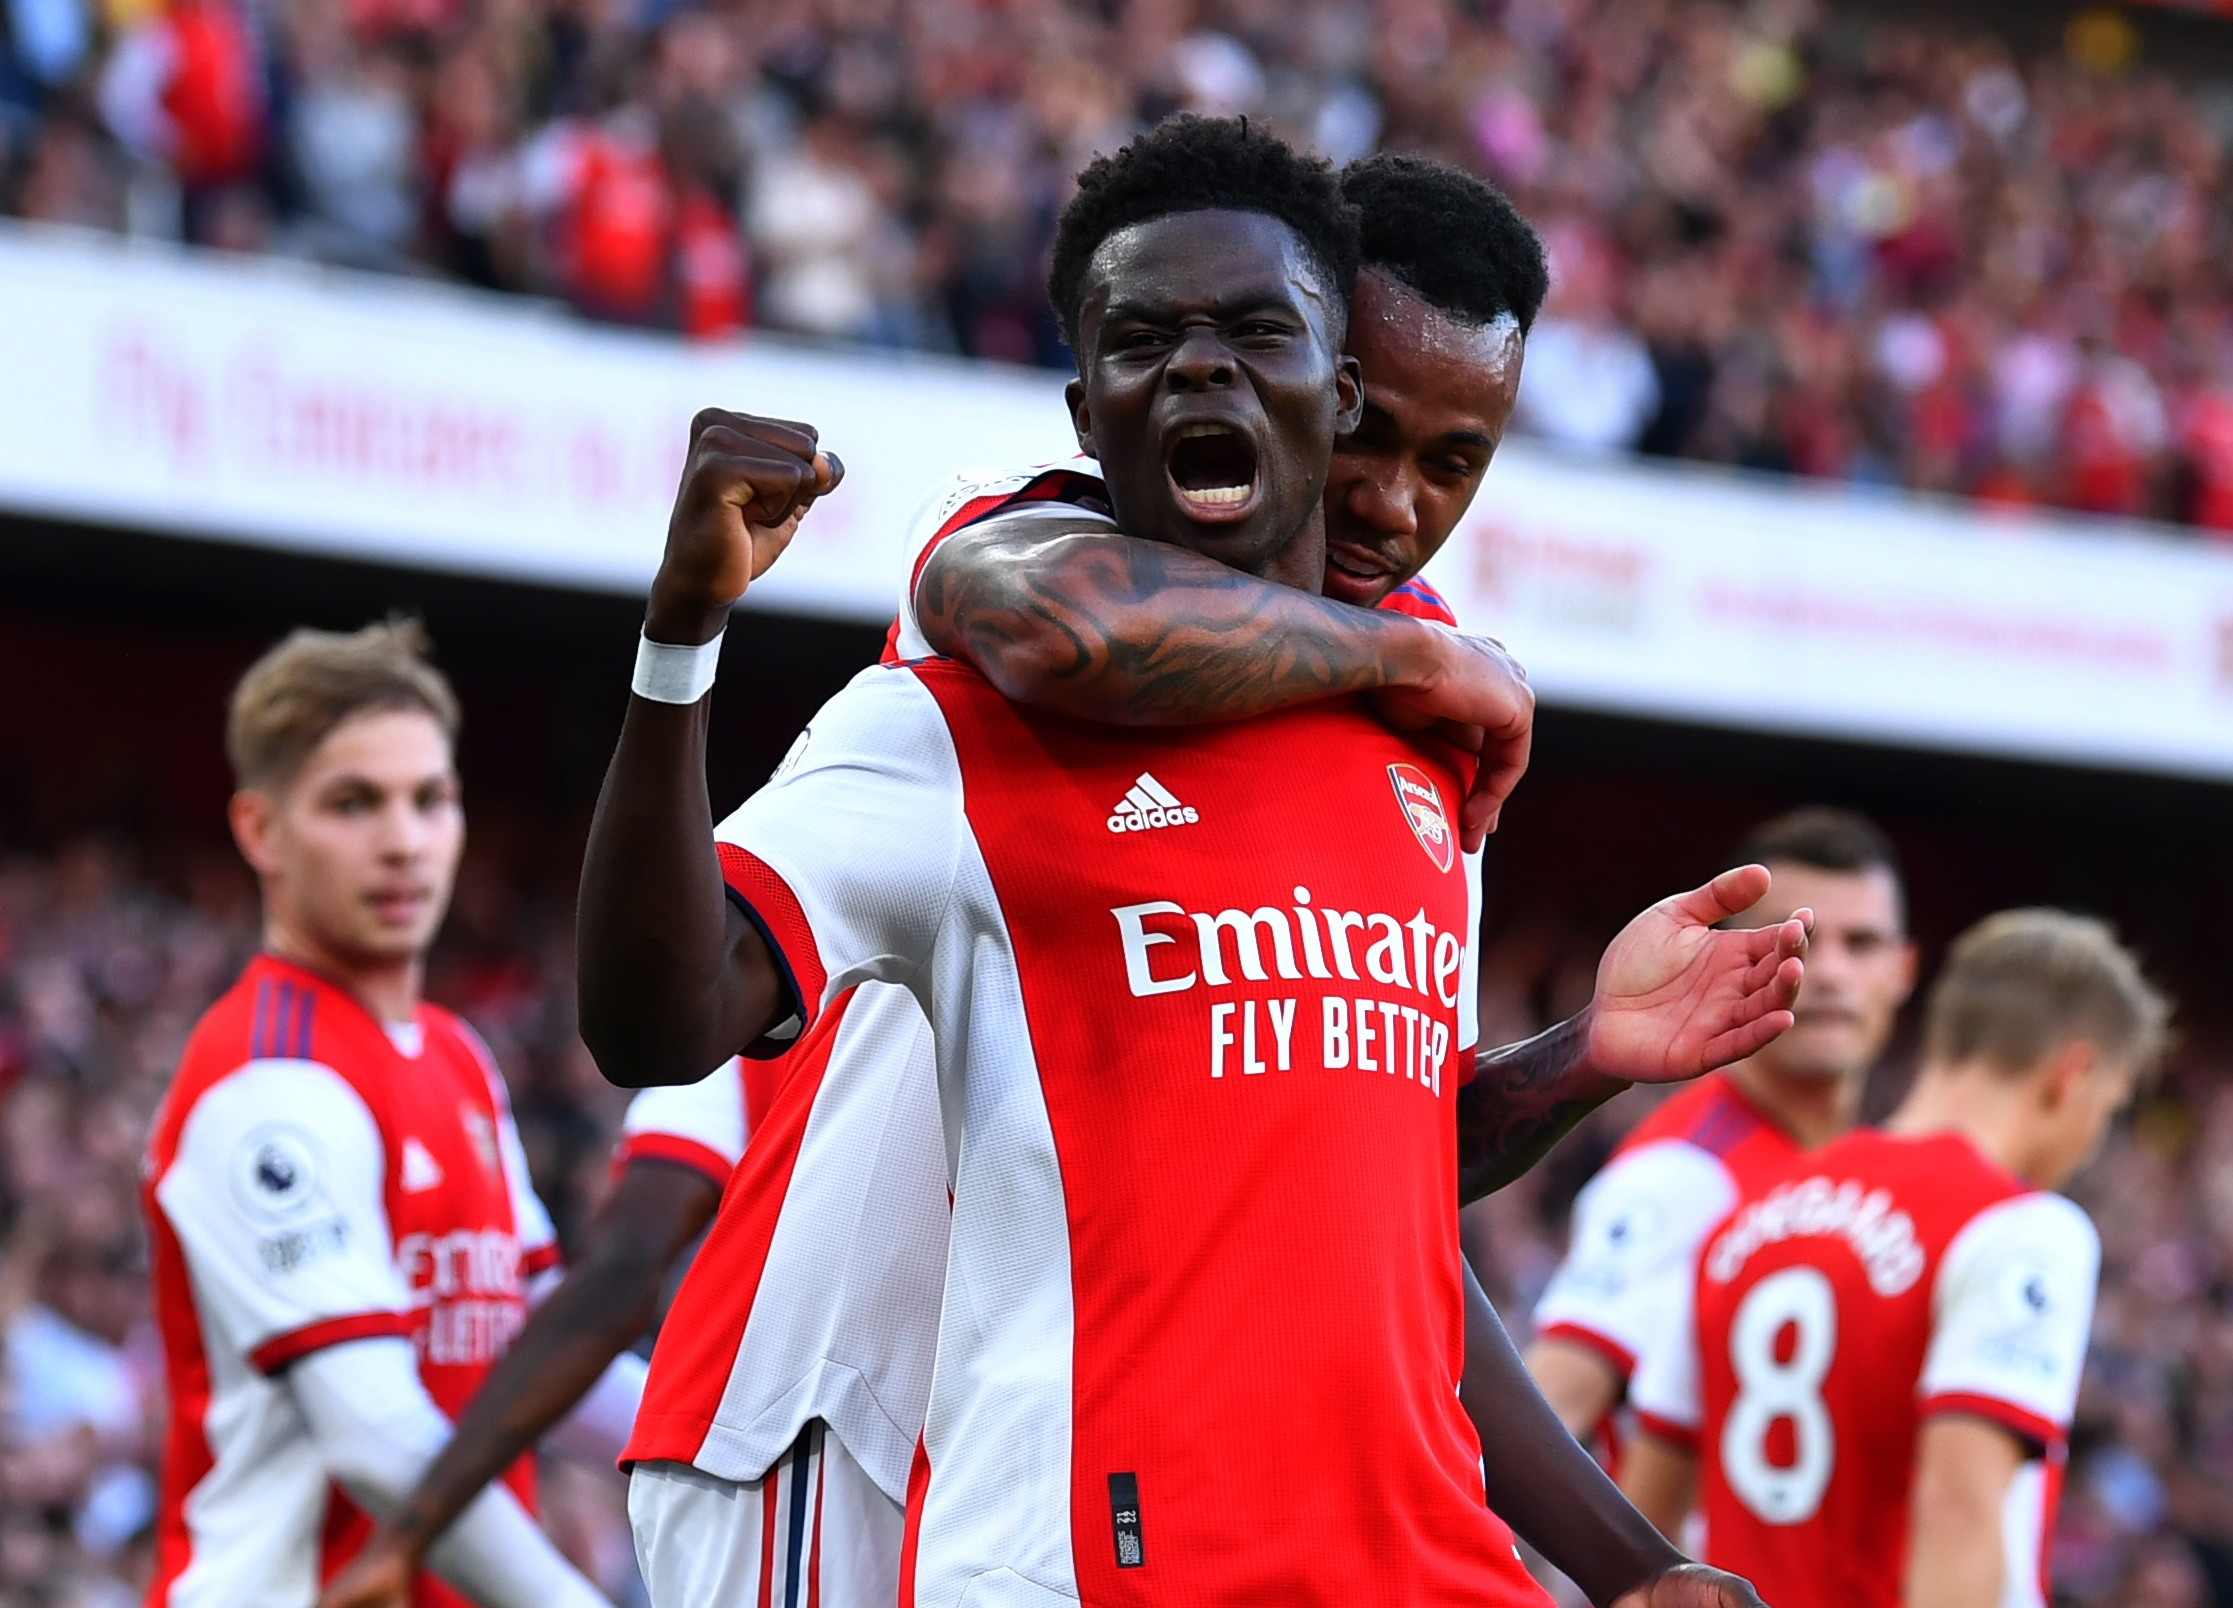 Premier League, Άρσεναλ – Τότεναμ 3-1: Πήραν το λονδρέζικο ντέρμπι οι κανονιέρηδες